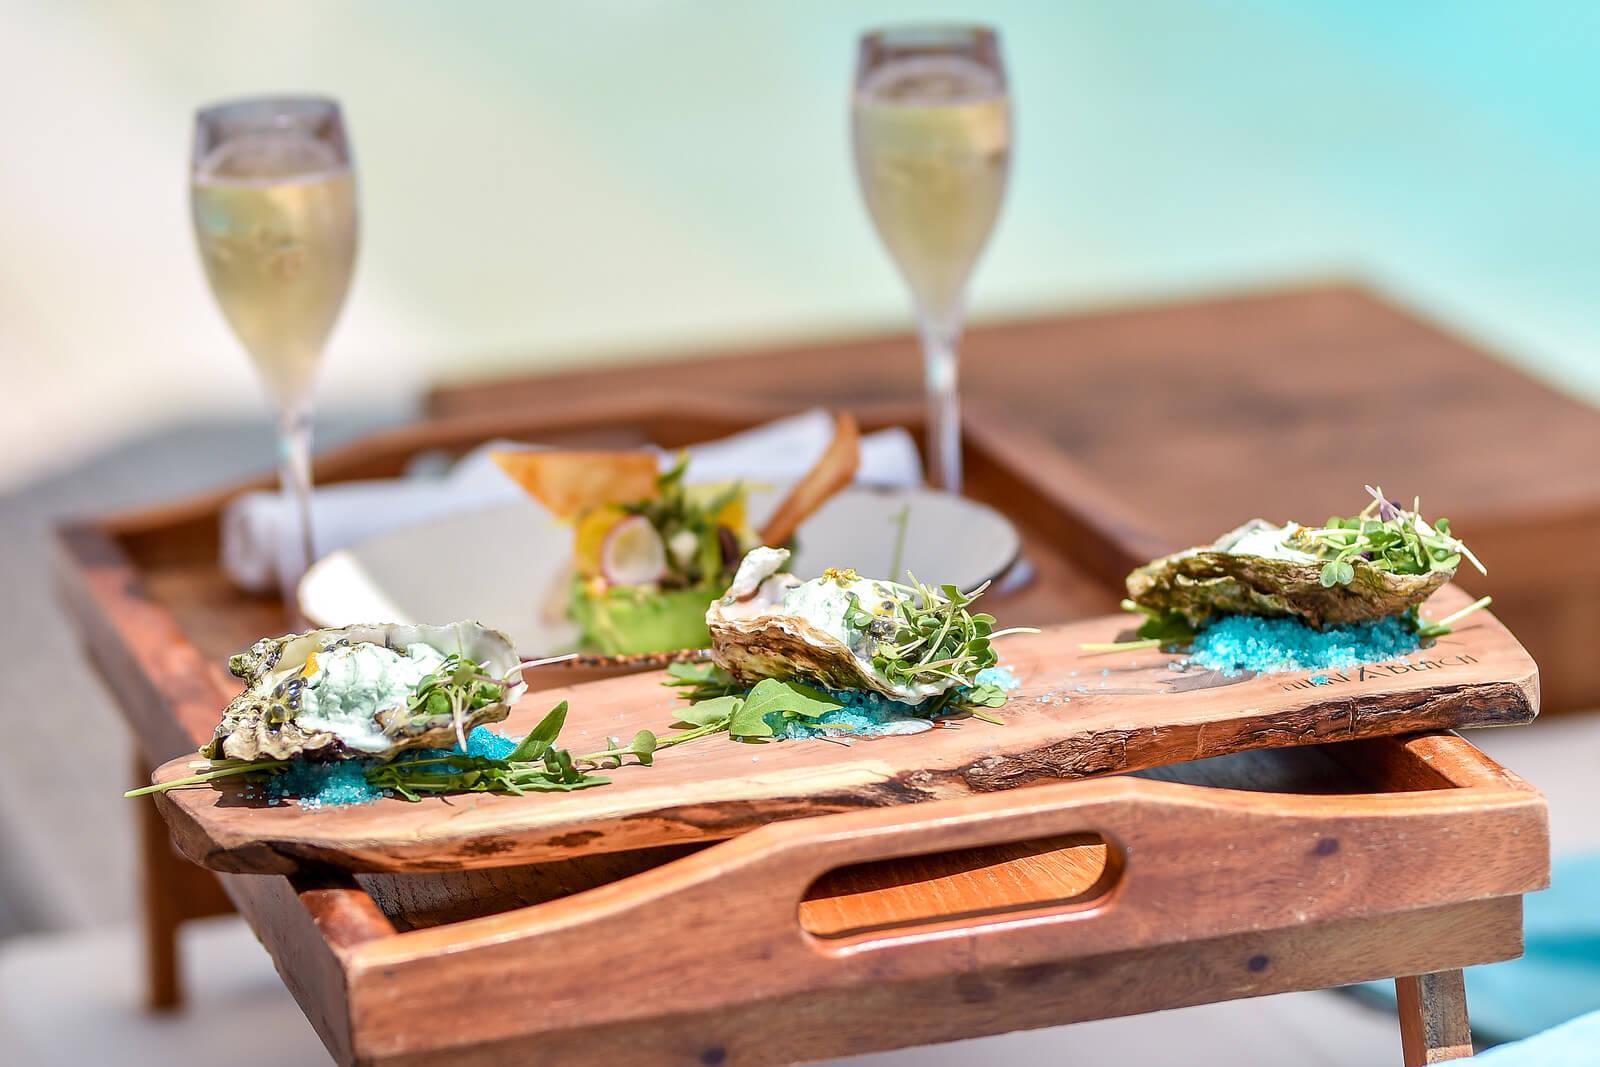 https://www.white-ibiza.com/wp-content/uploads/2020/03/white-ibiza-restaurants-nikki-beach-ibiza-2020-14.jpg